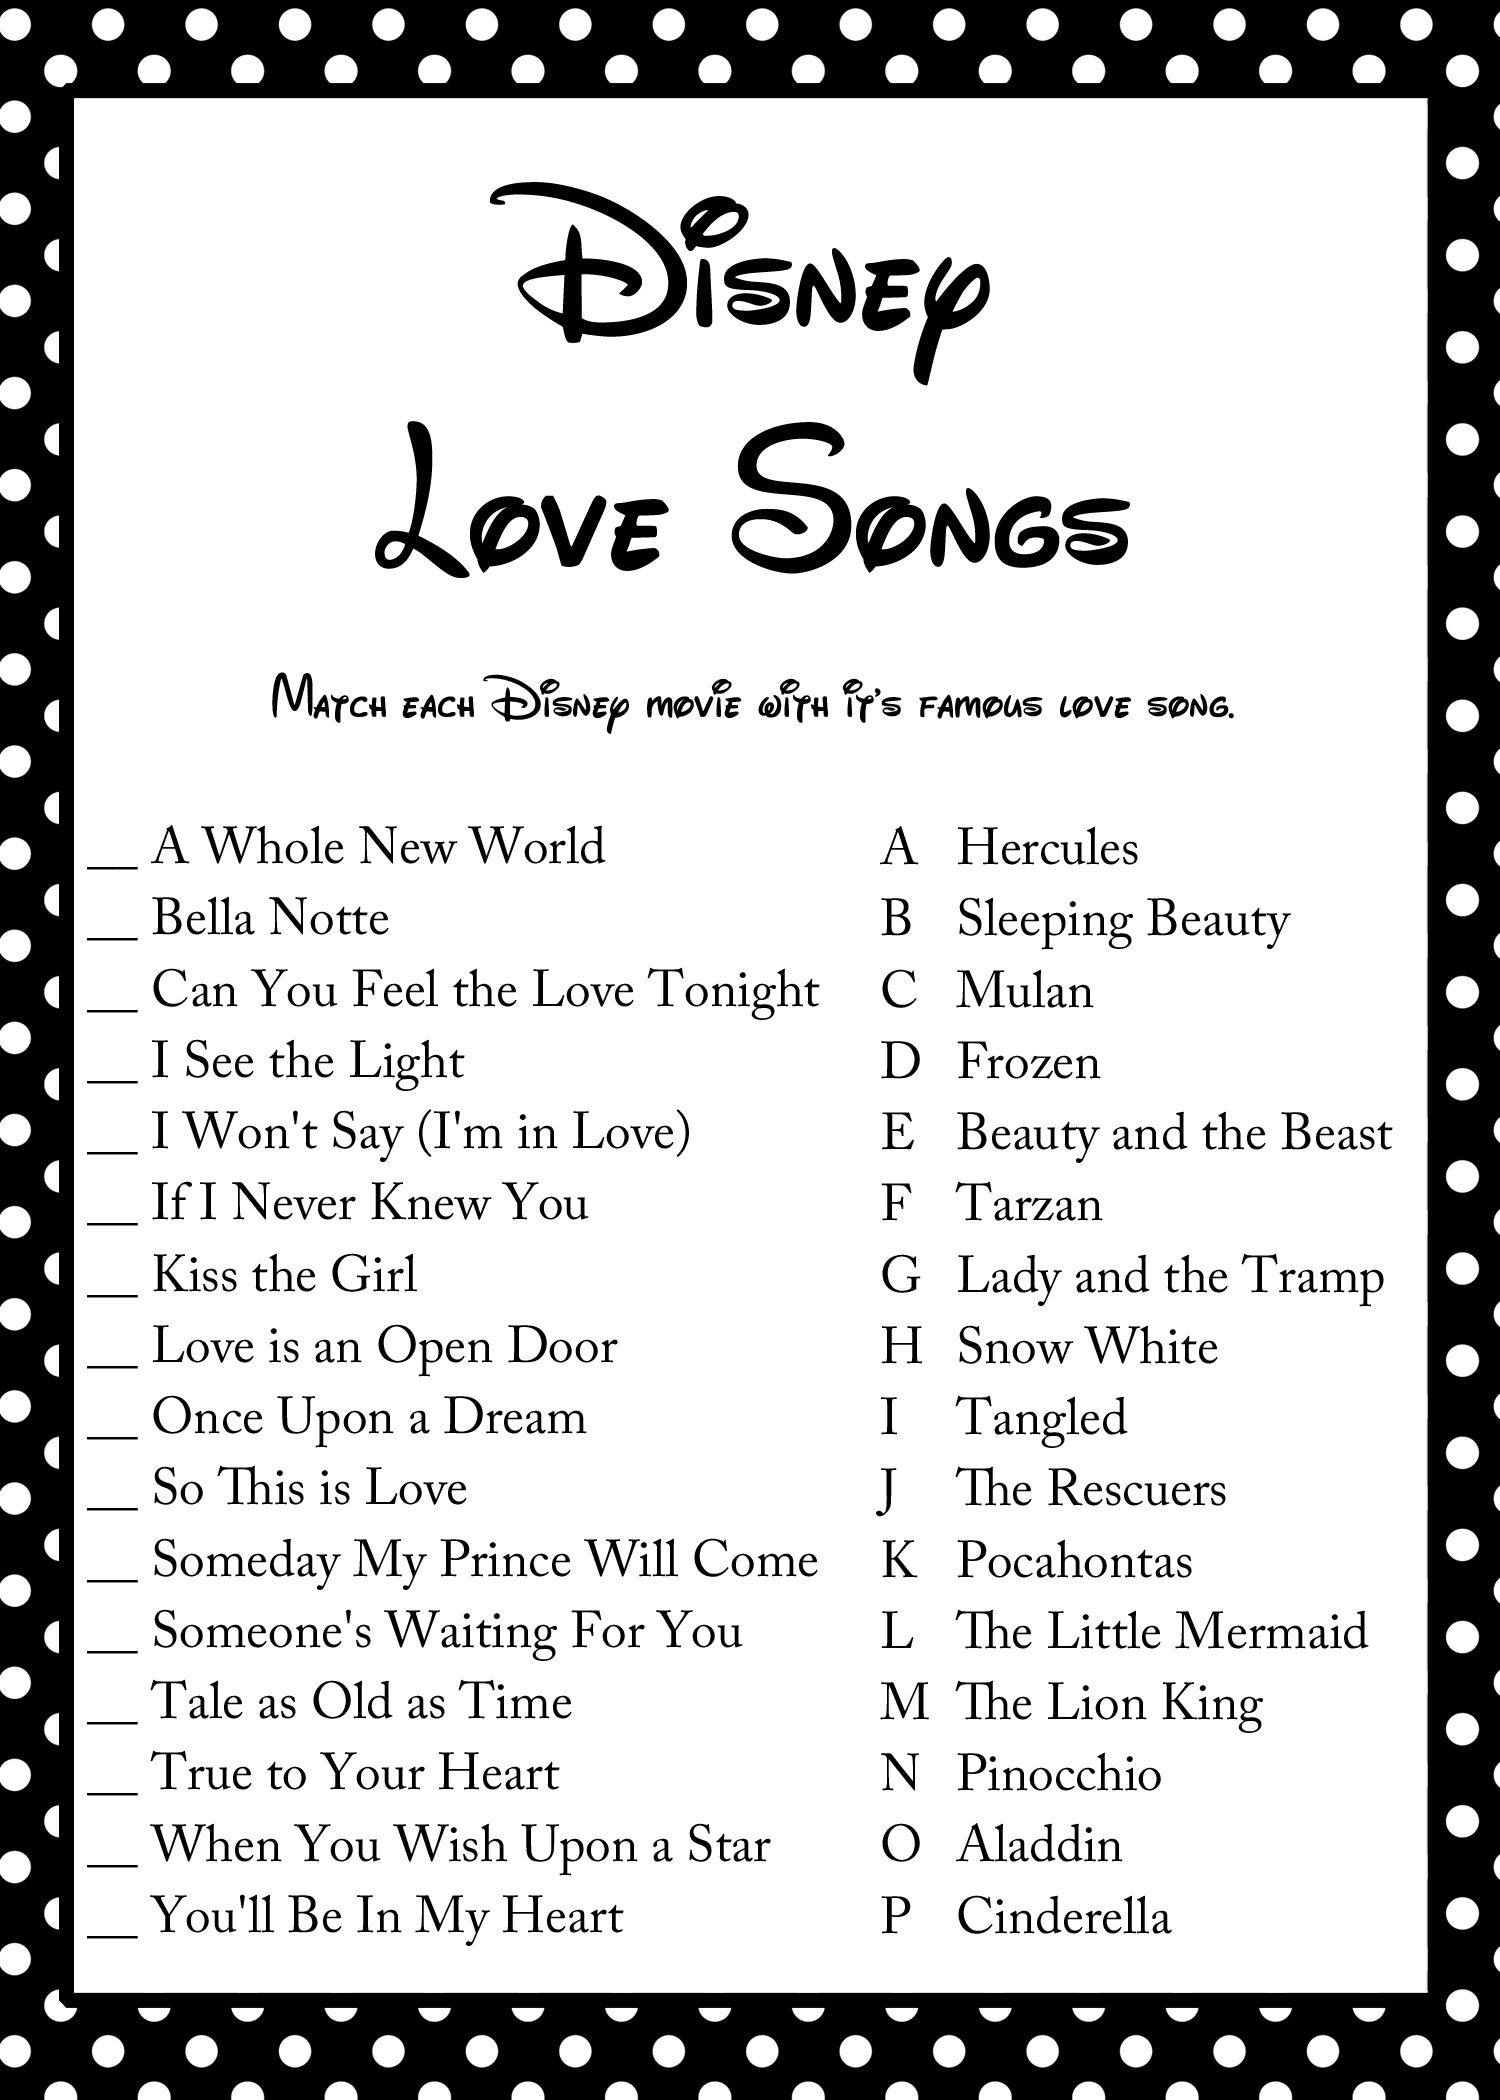 Uncategorized Love Matcher Game www bridalshowerideas4u com wp content uploads 2016 03 free disney love